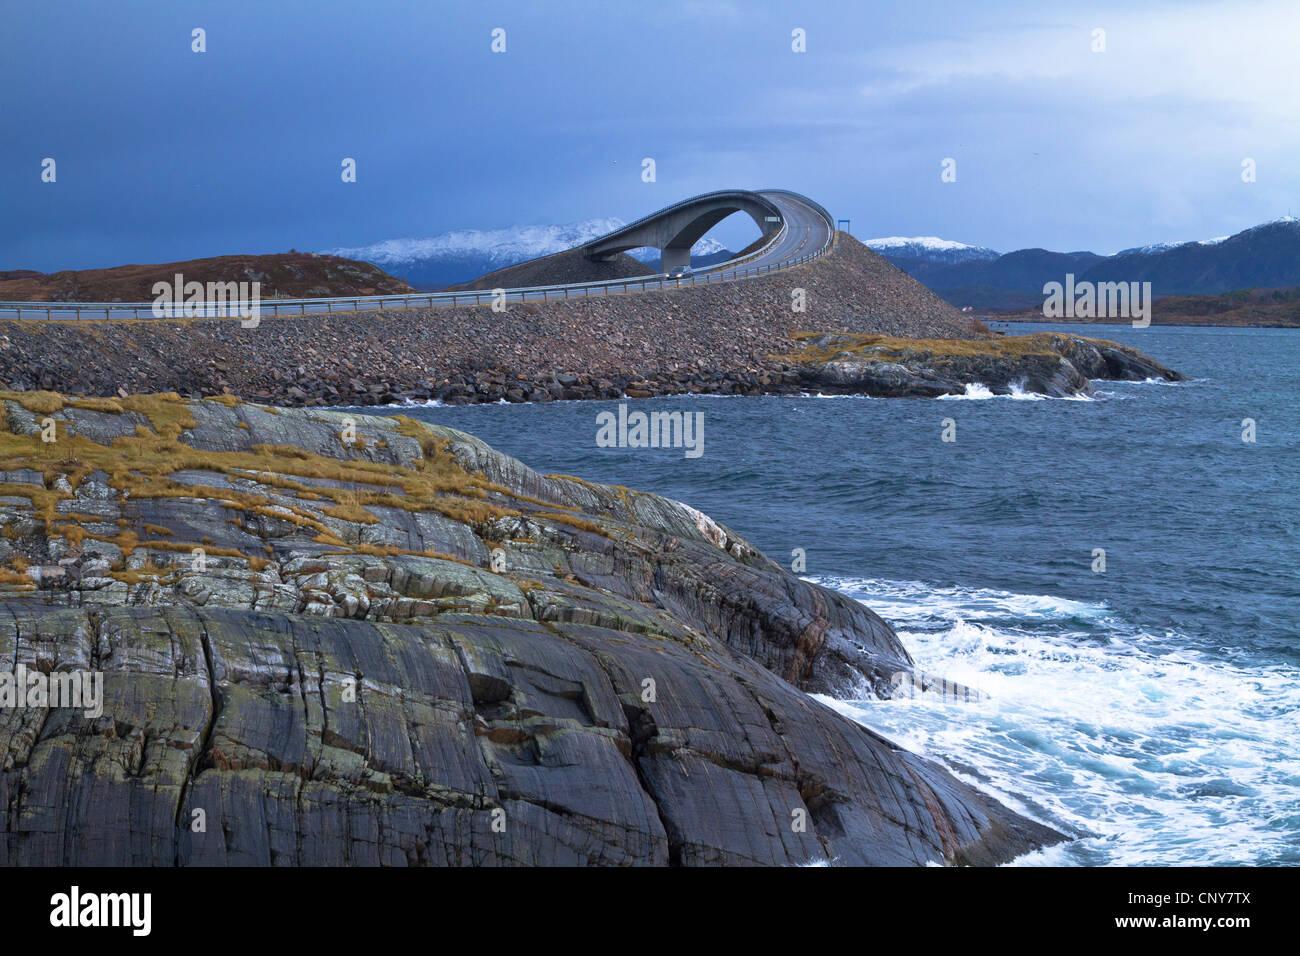 Atlantic road and arch bridge between Kristiansund and Molde, Norway - Stock Image